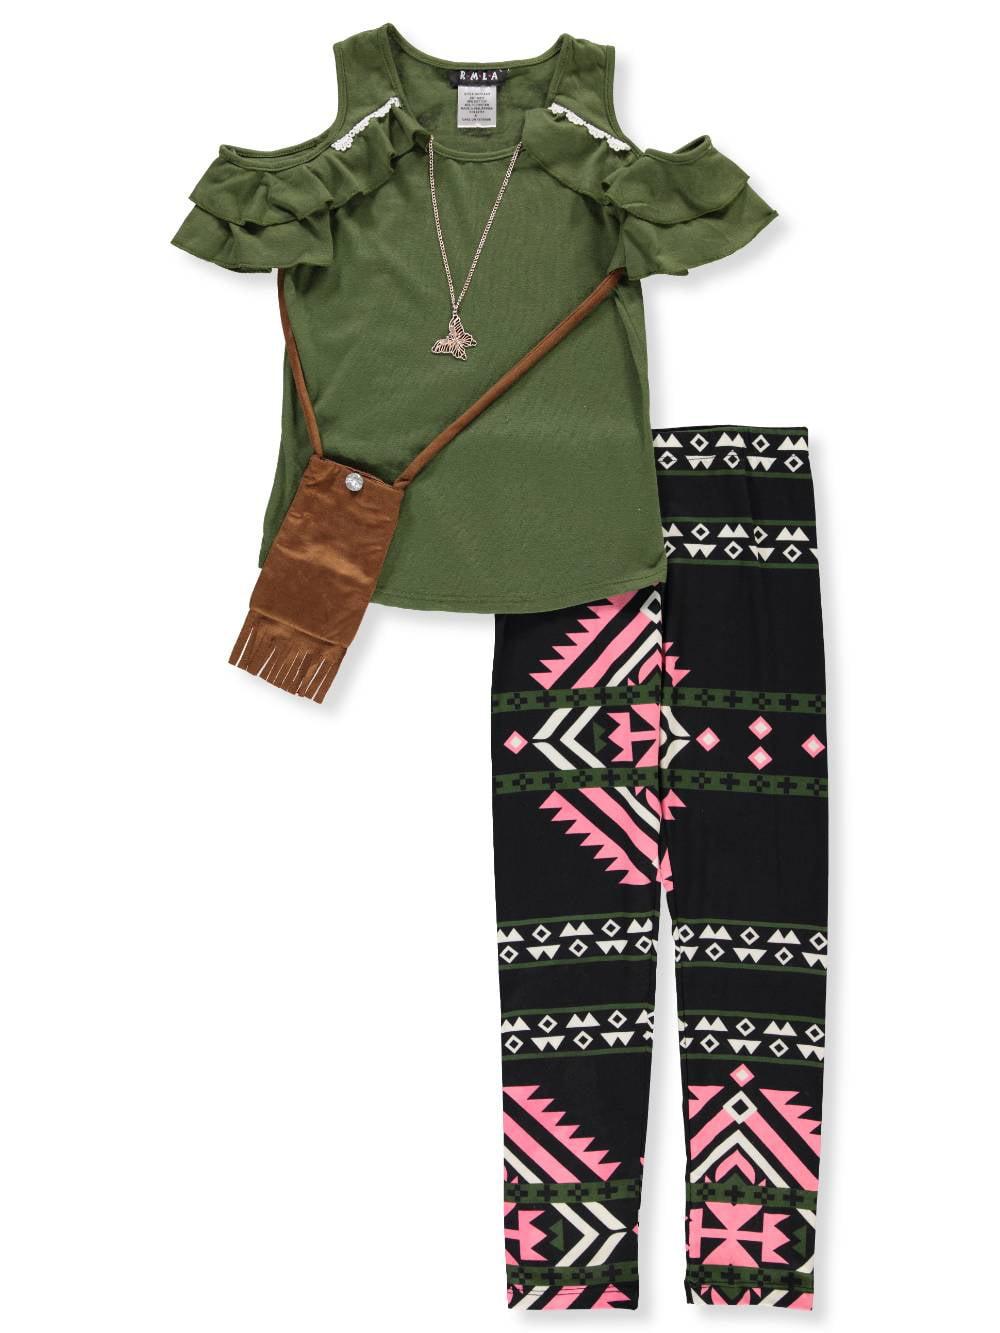 RMLA Girls/' 2-Piece Leggings Set Outfit